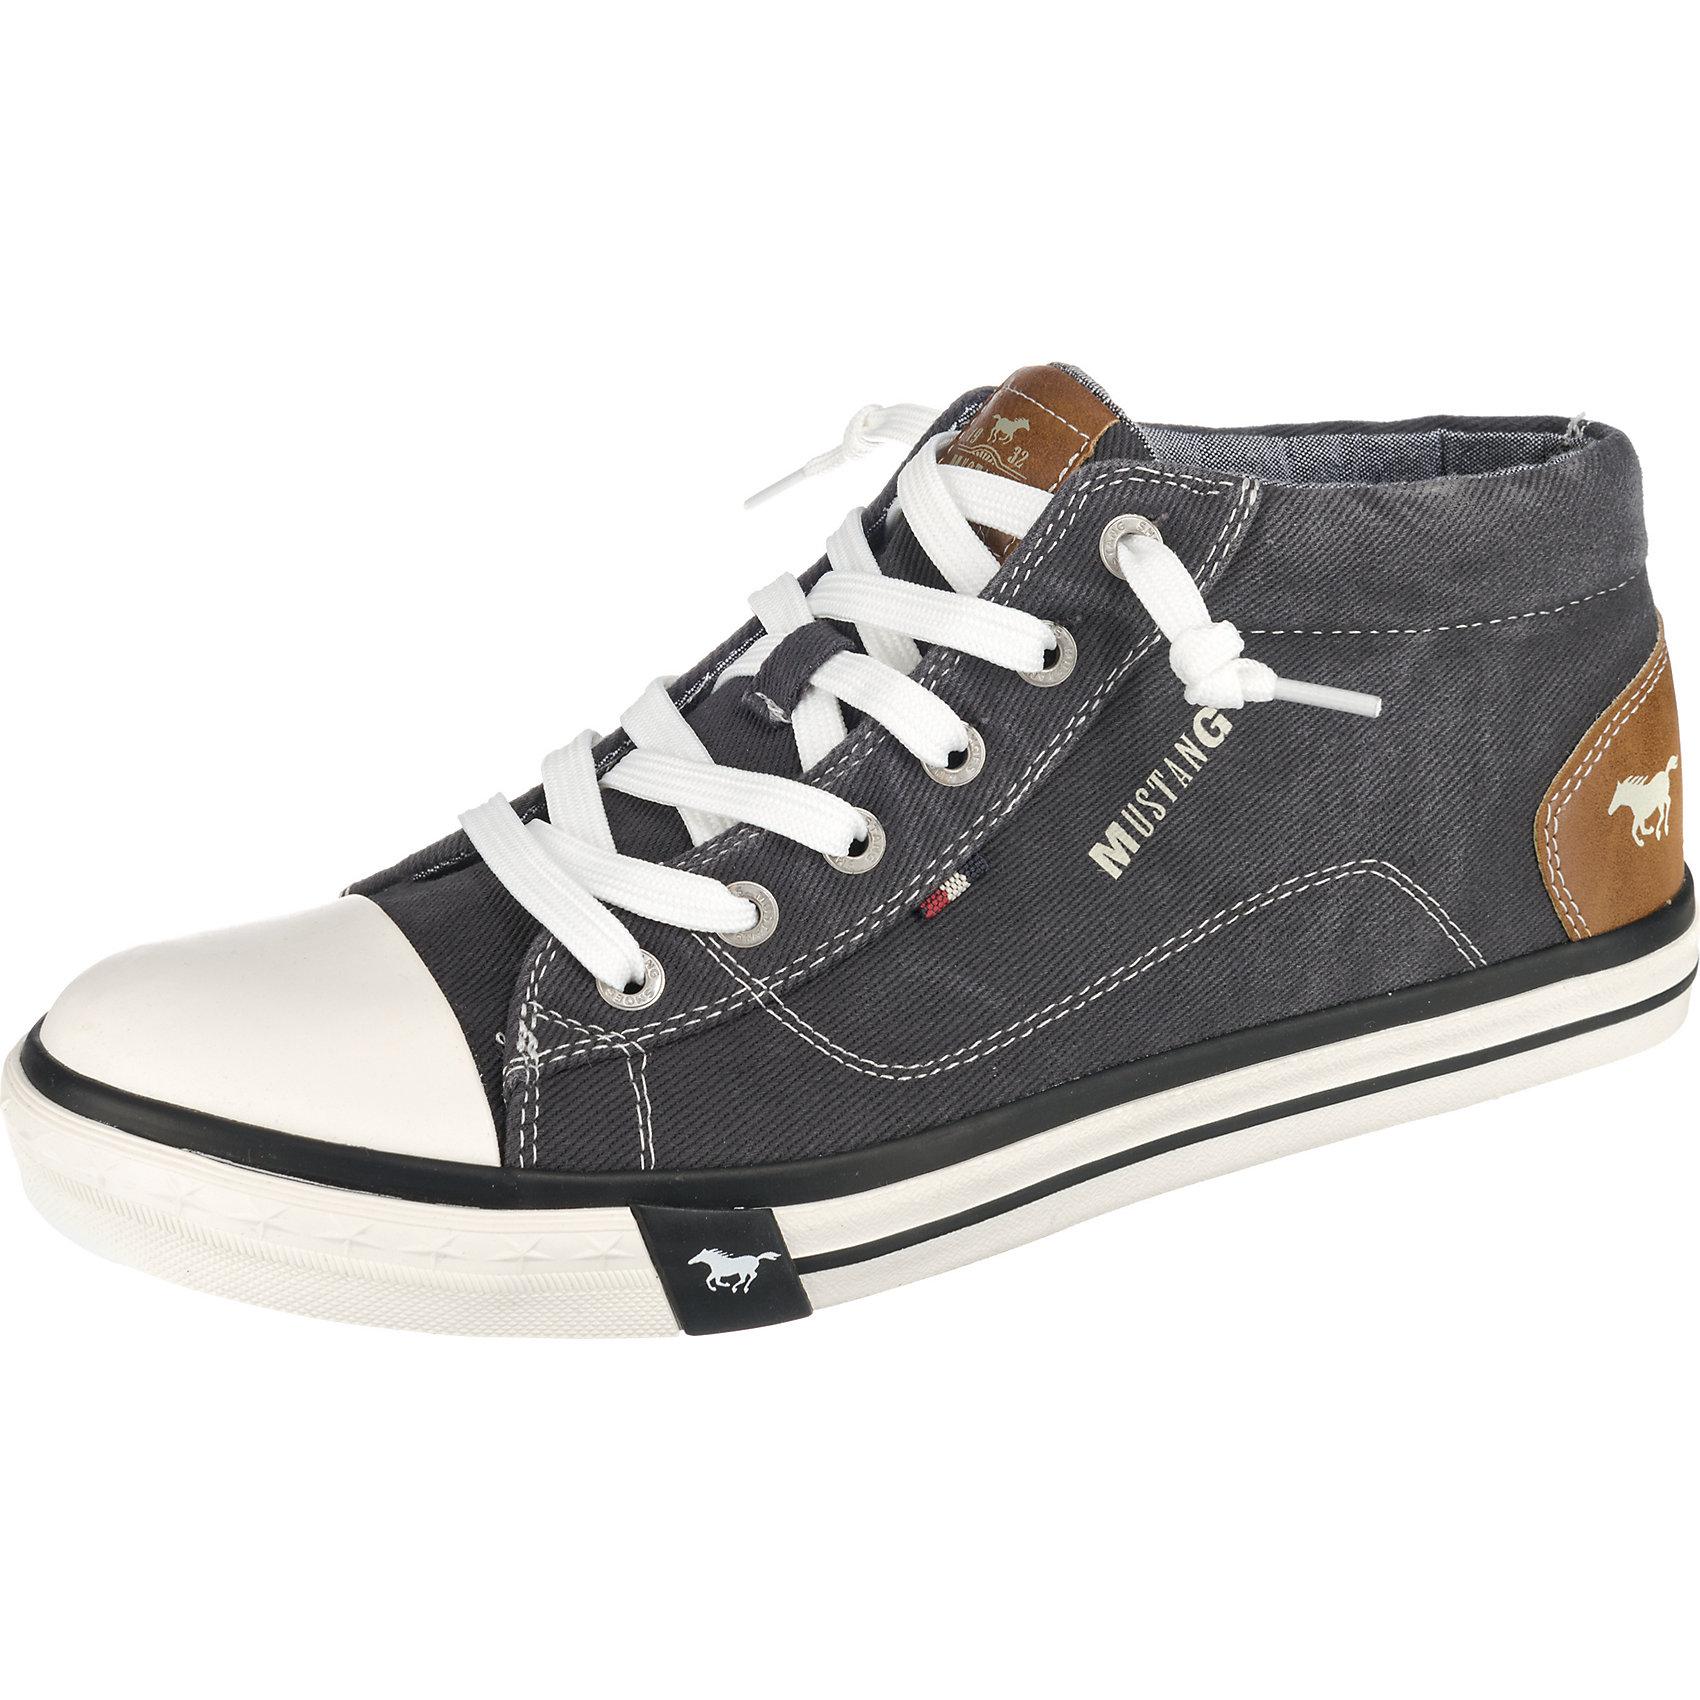 Neu High MUSTANG Sneakers High Neu 7567097 für Herren schwarz ec2b55